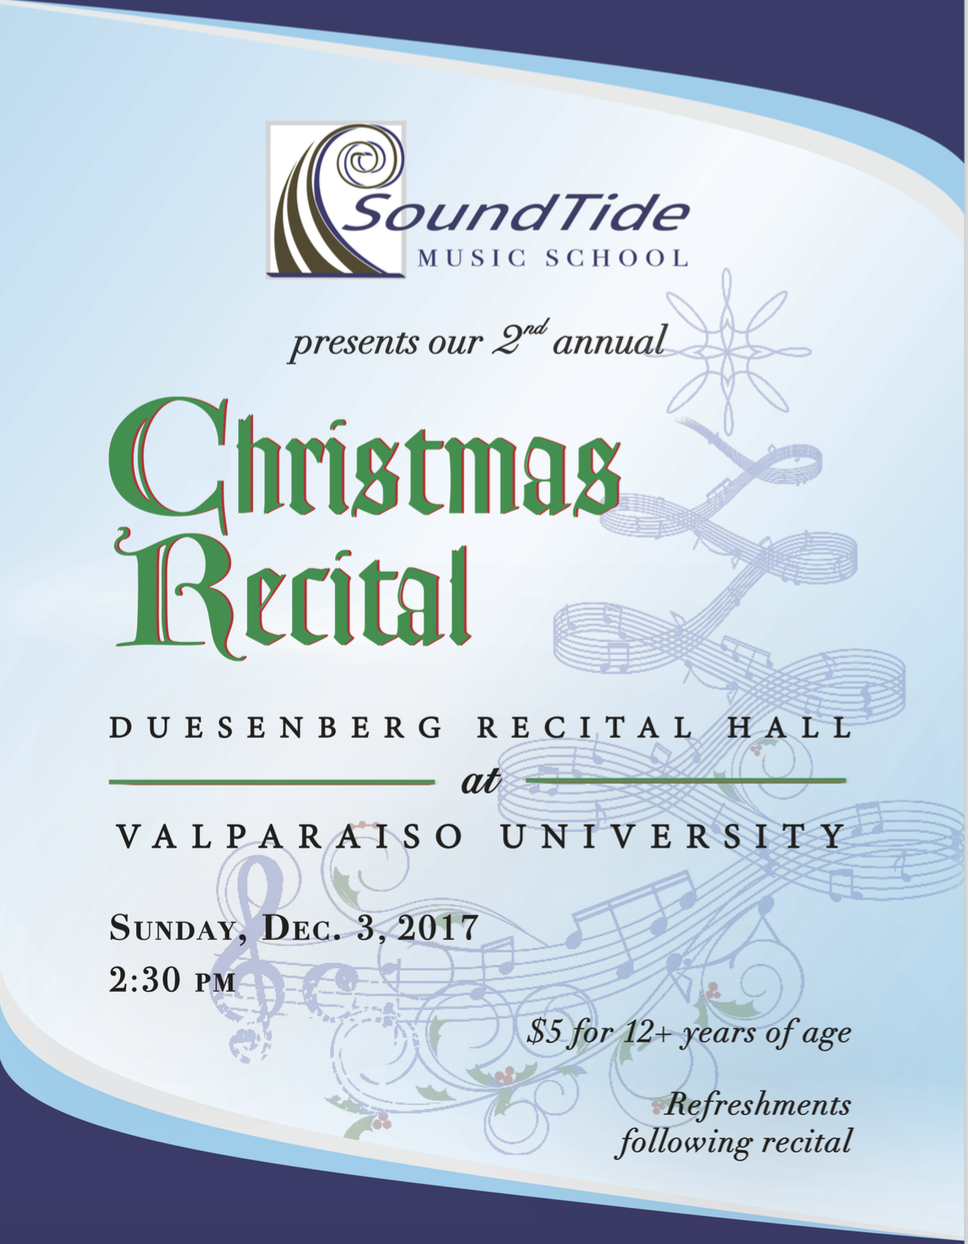 SoundTide Christmas Recital 2017.png